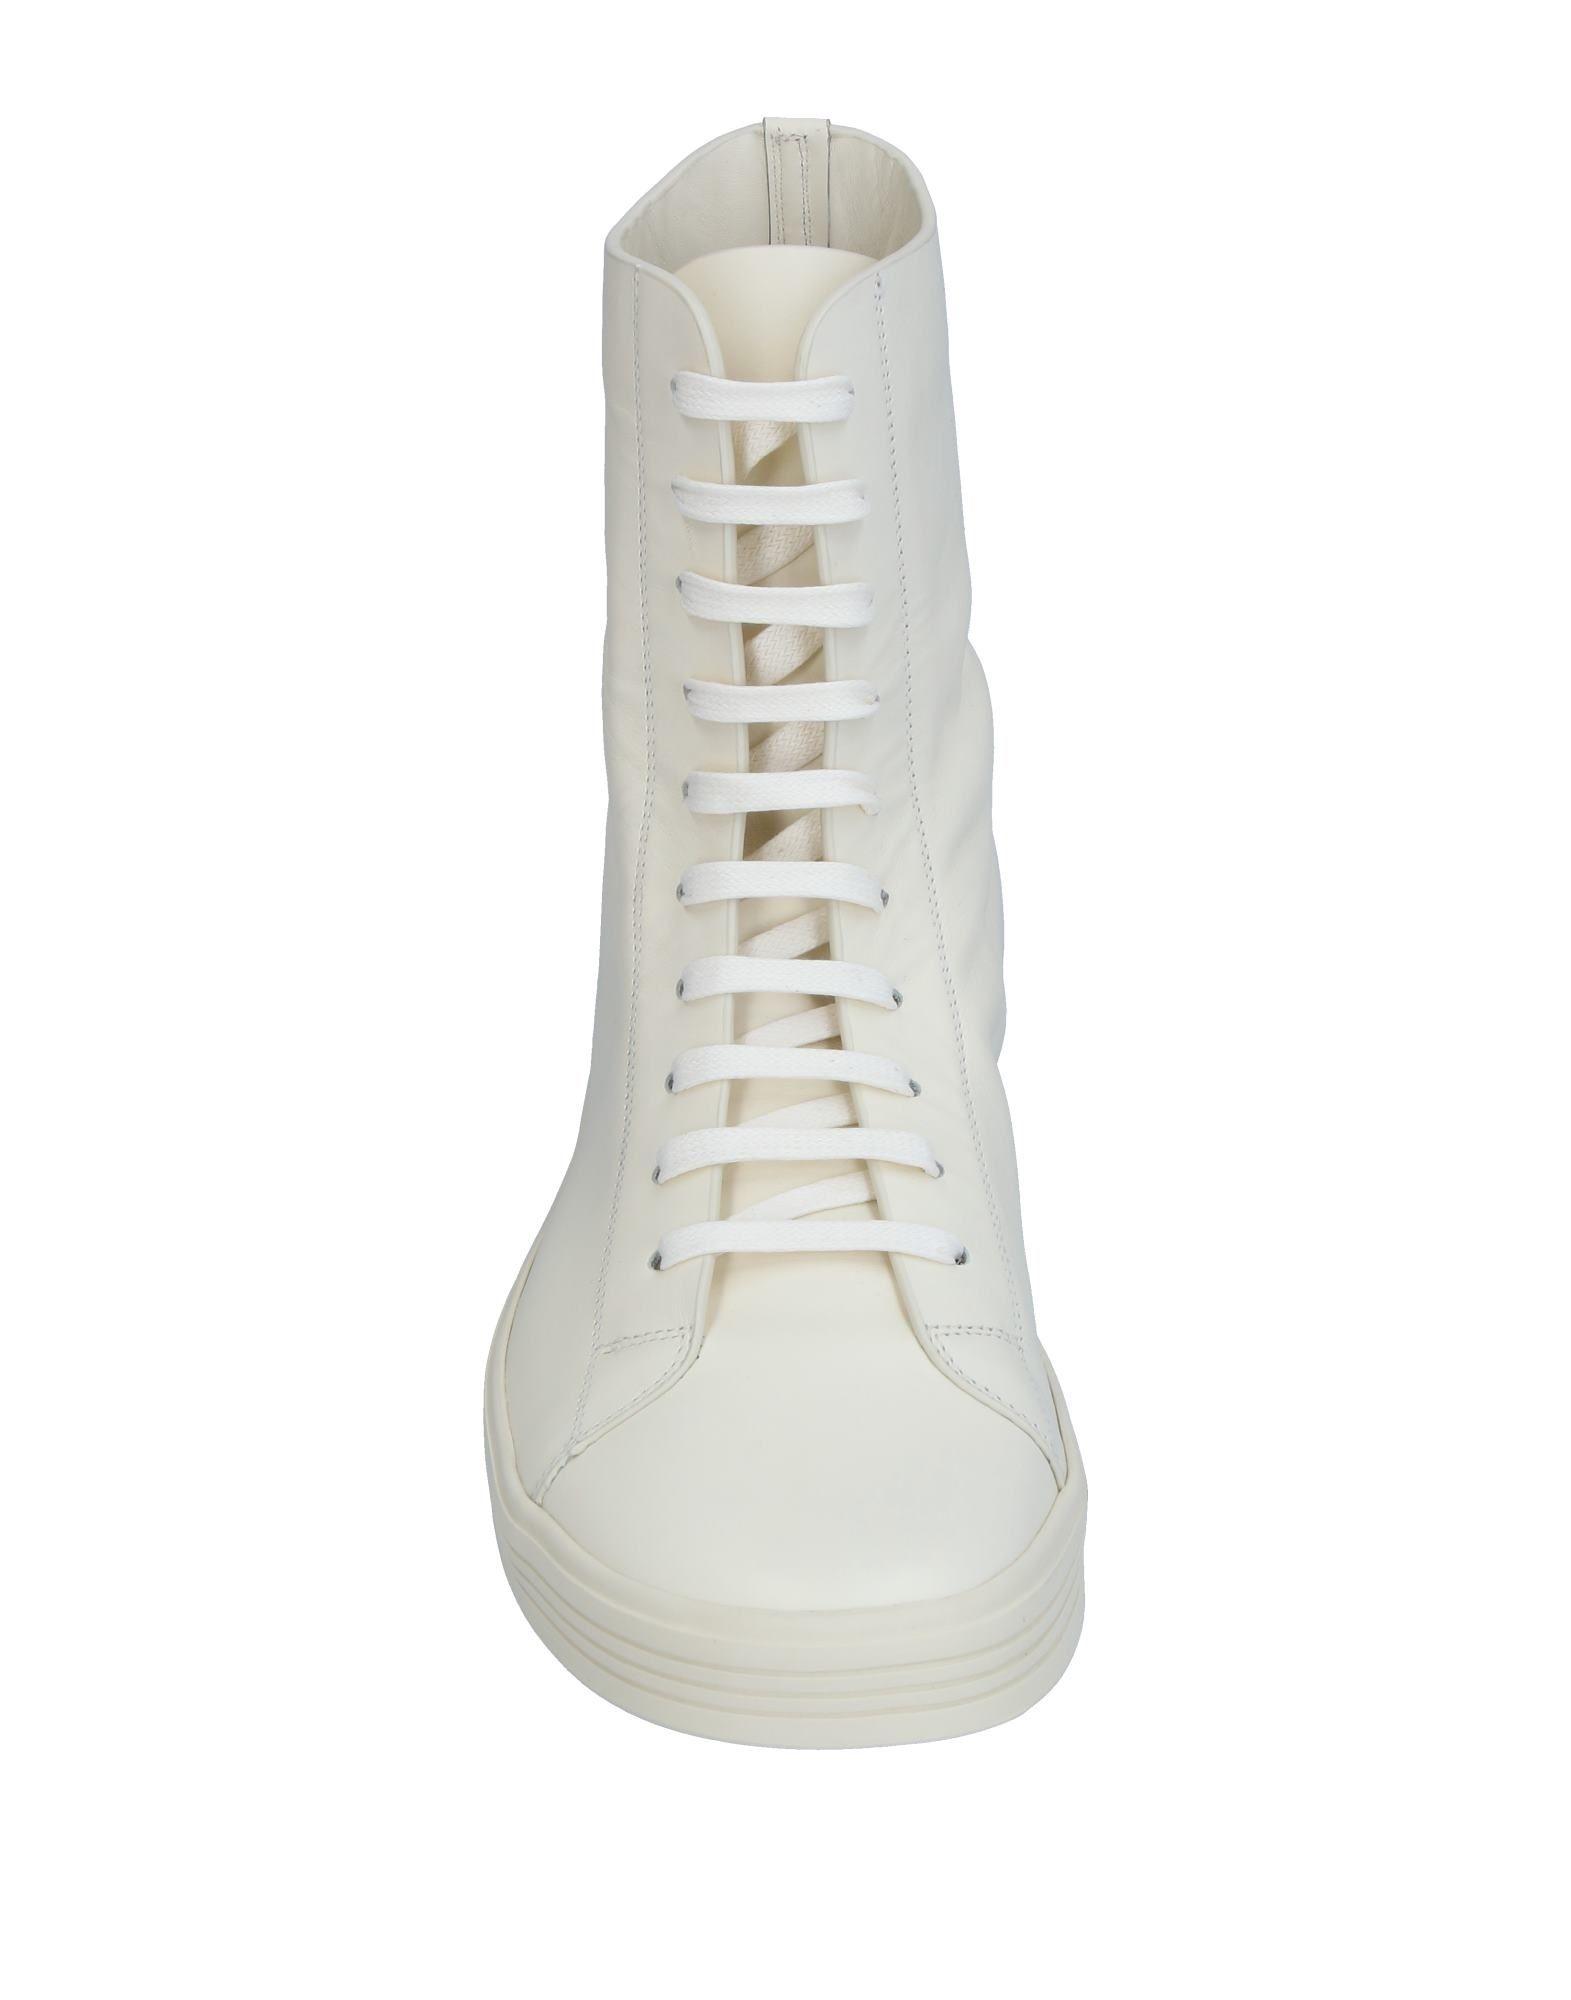 Rick Owens Sneakers Herren  11356930BS Gute Qualität beliebte Schuhe